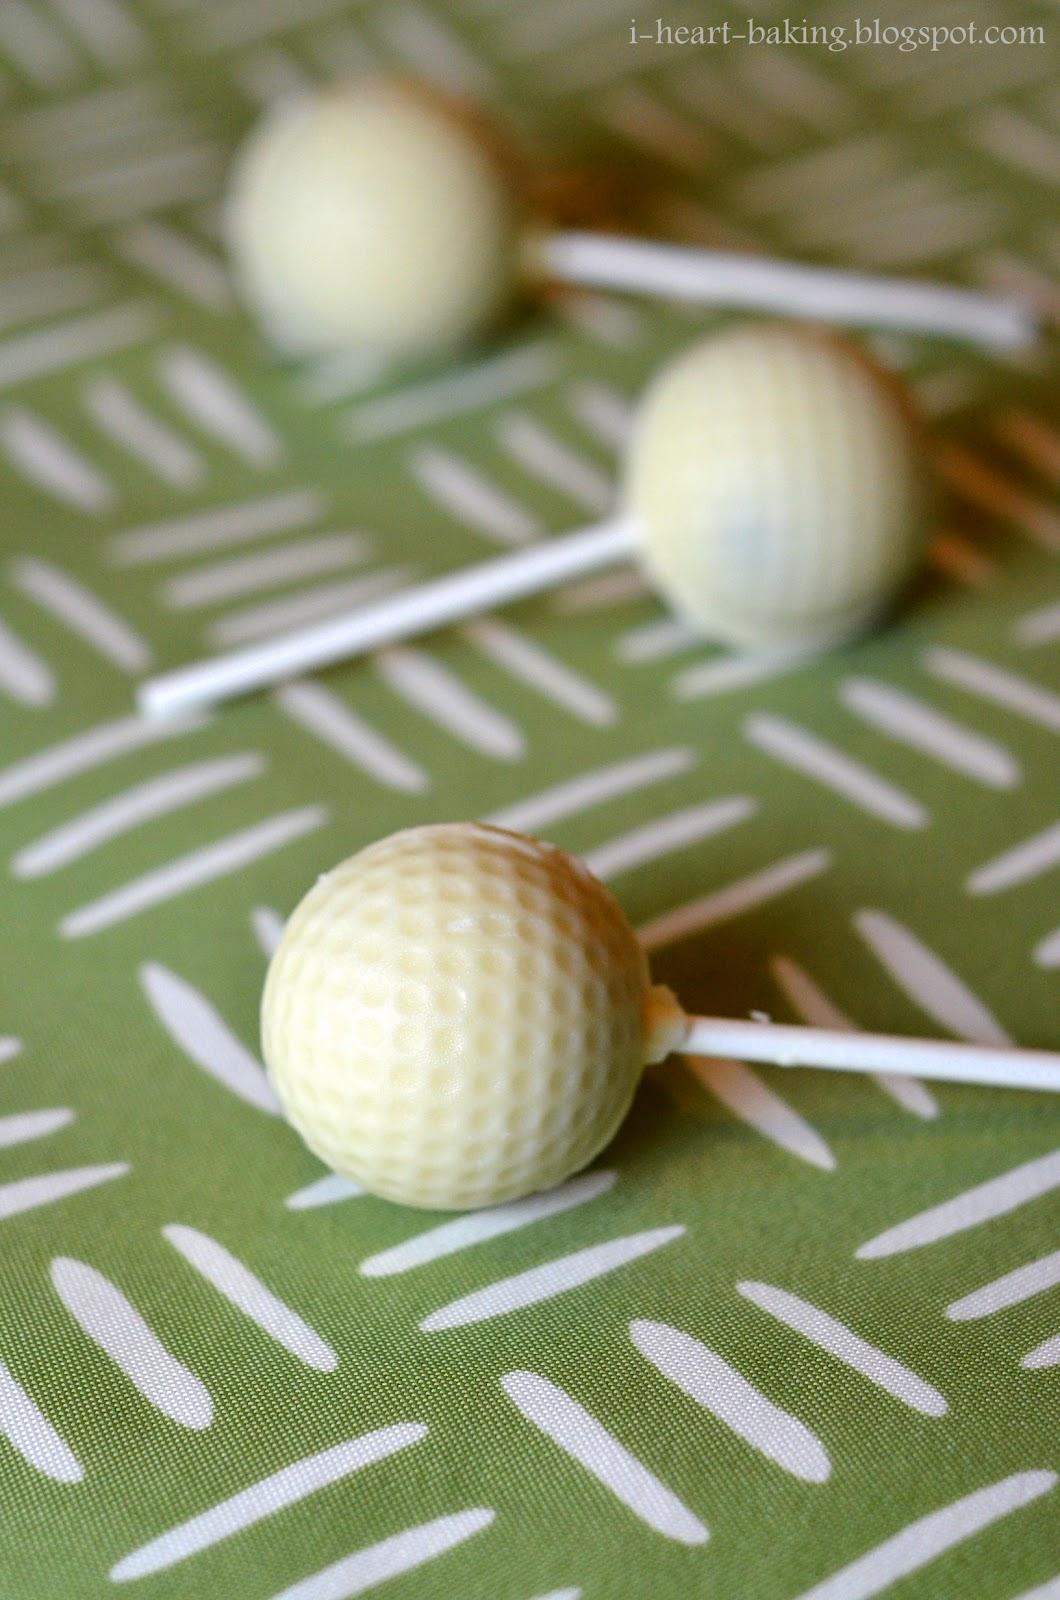 Ball Molds For Baking Those Golf Ball Molds